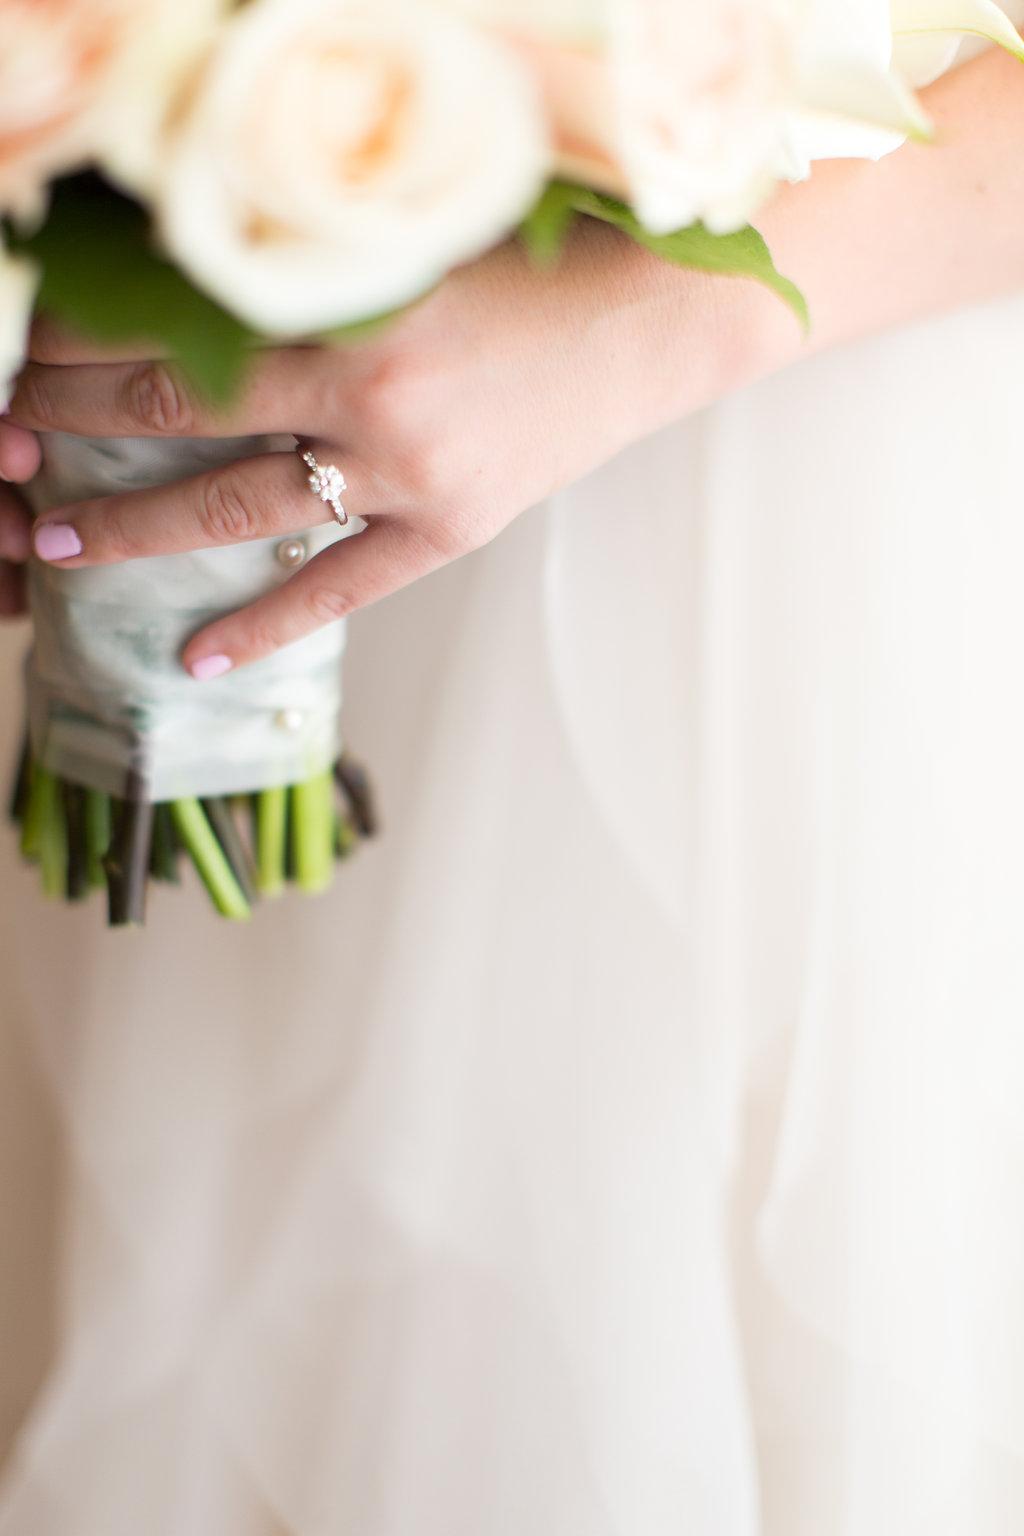 Solataire Wedding Ring